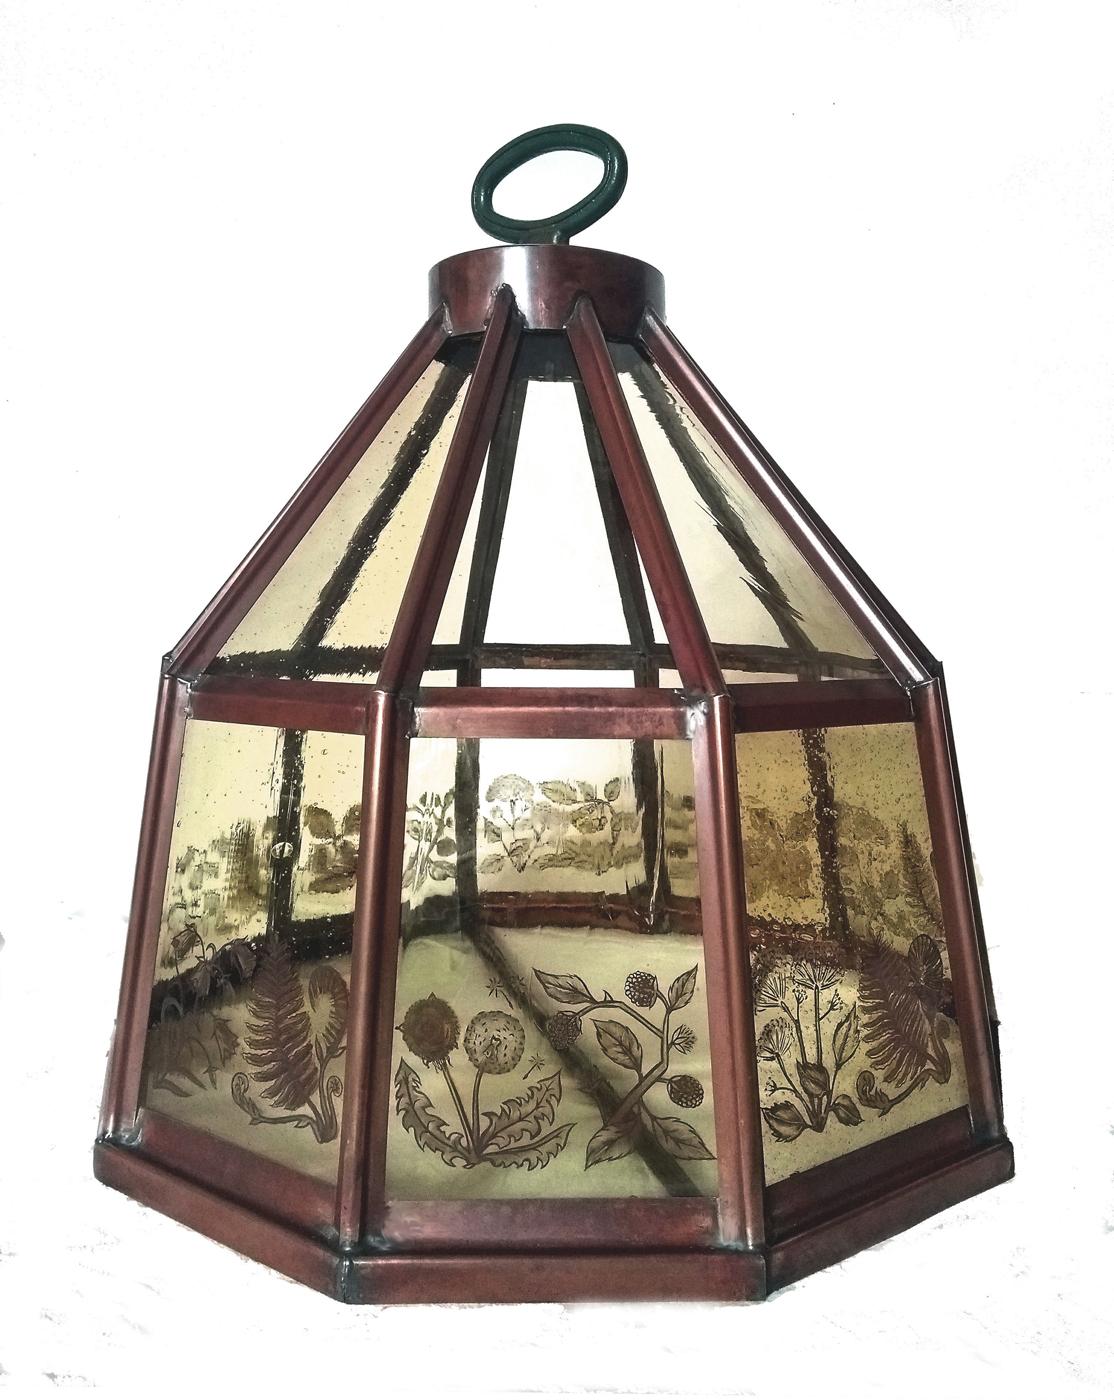 Hedgerow lantern in studio